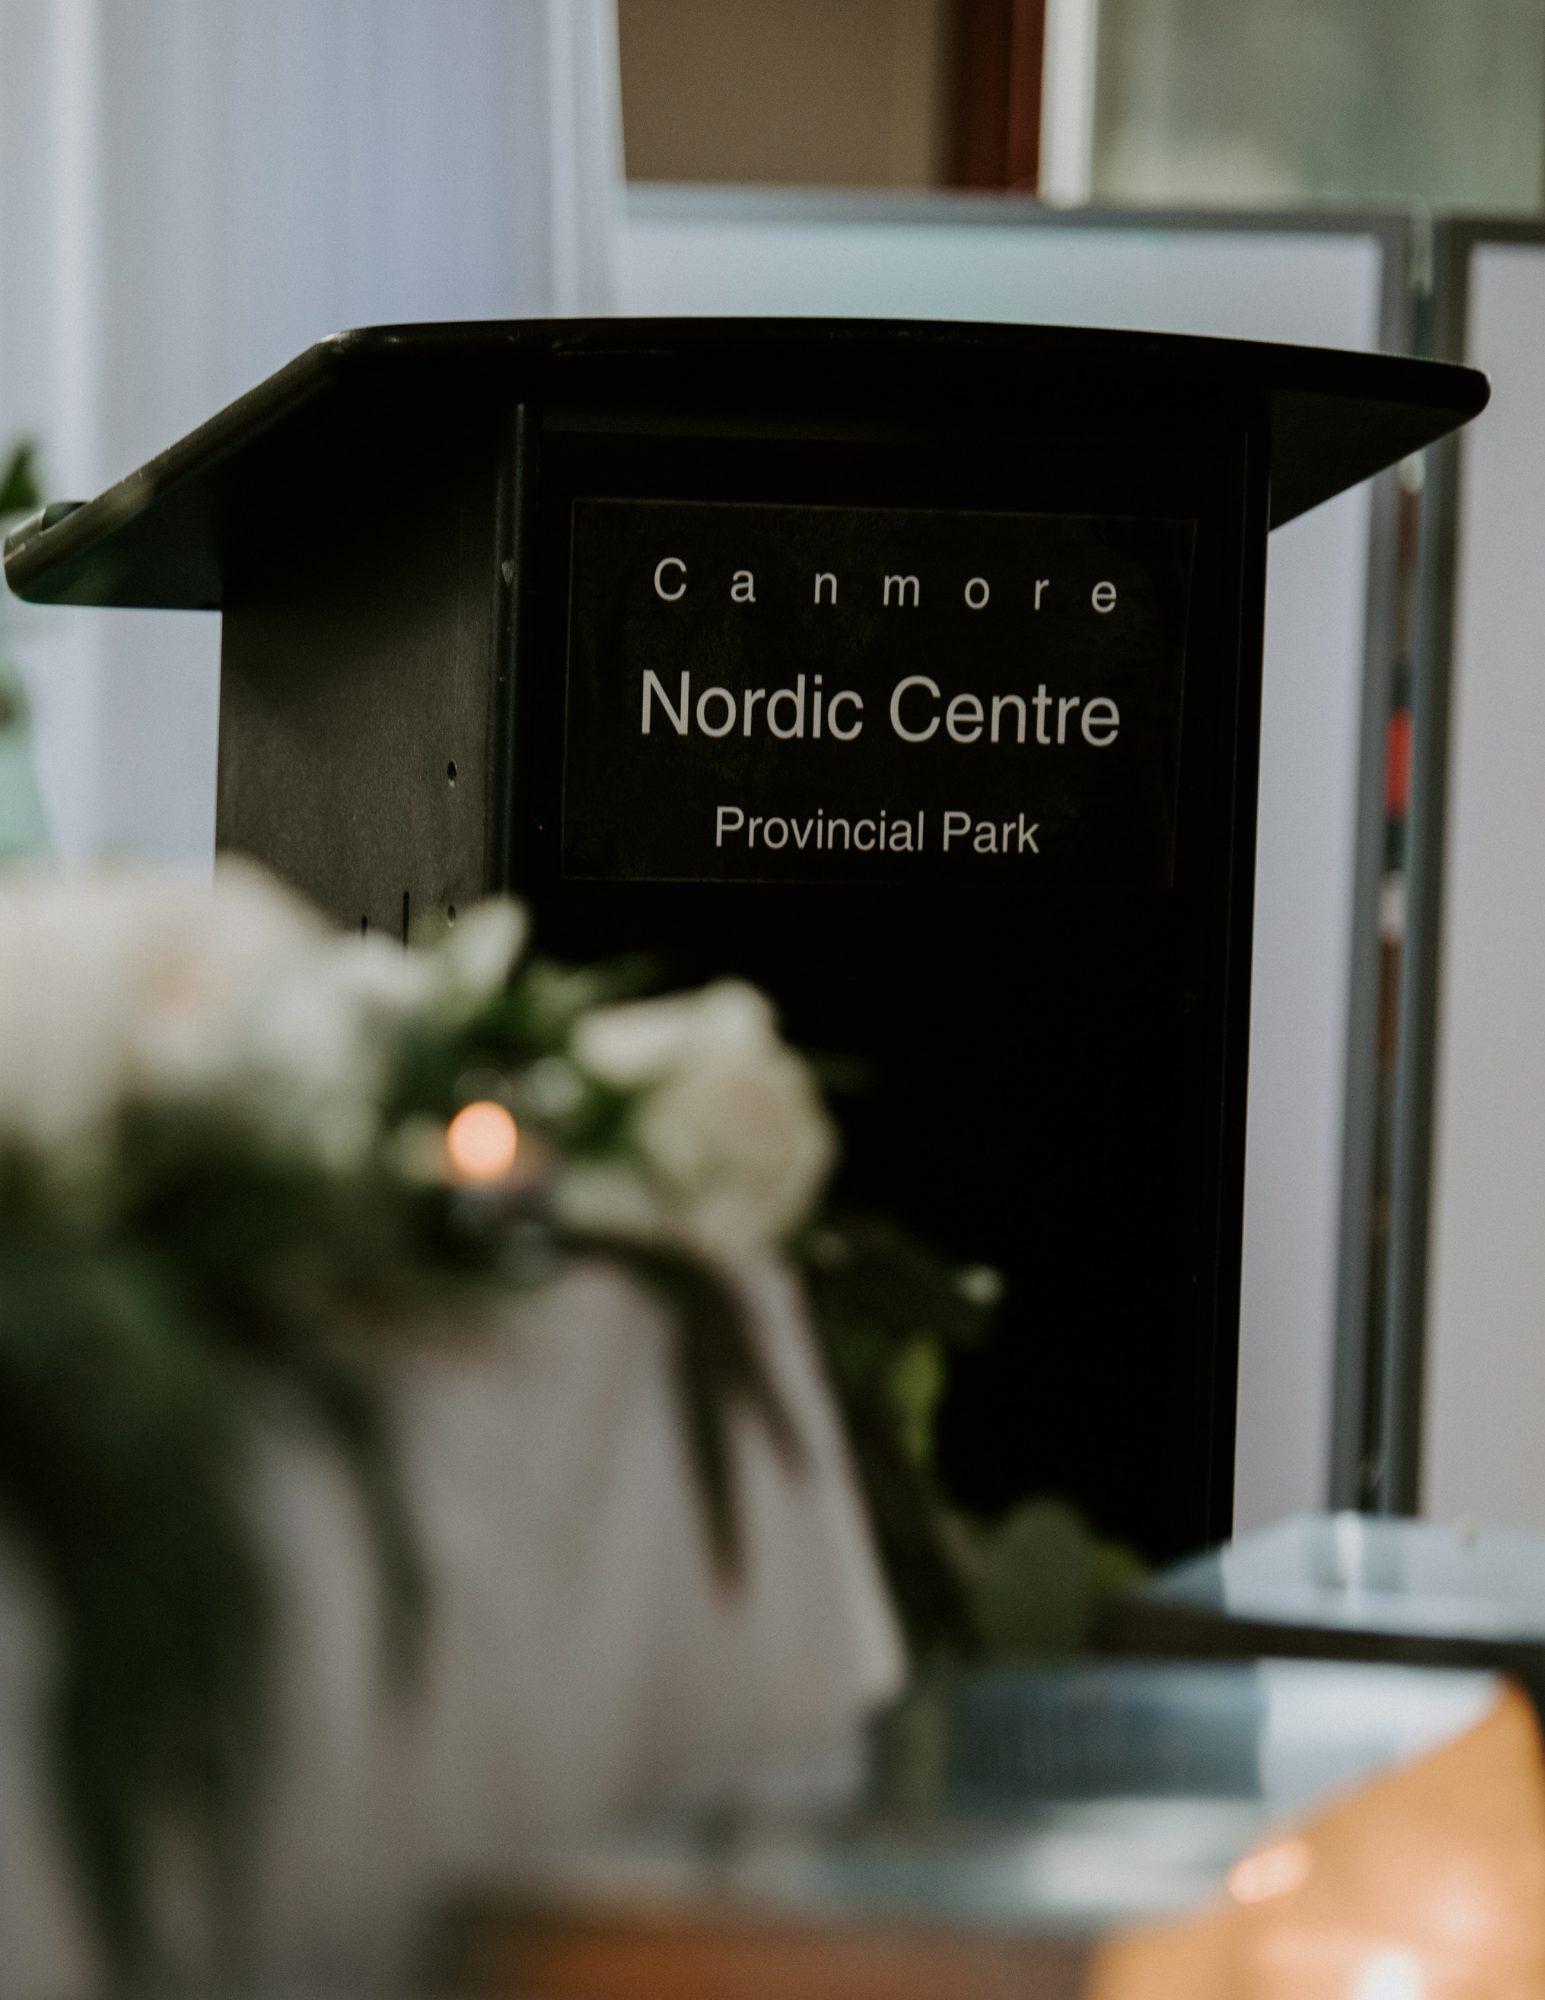 canmore nordic centre